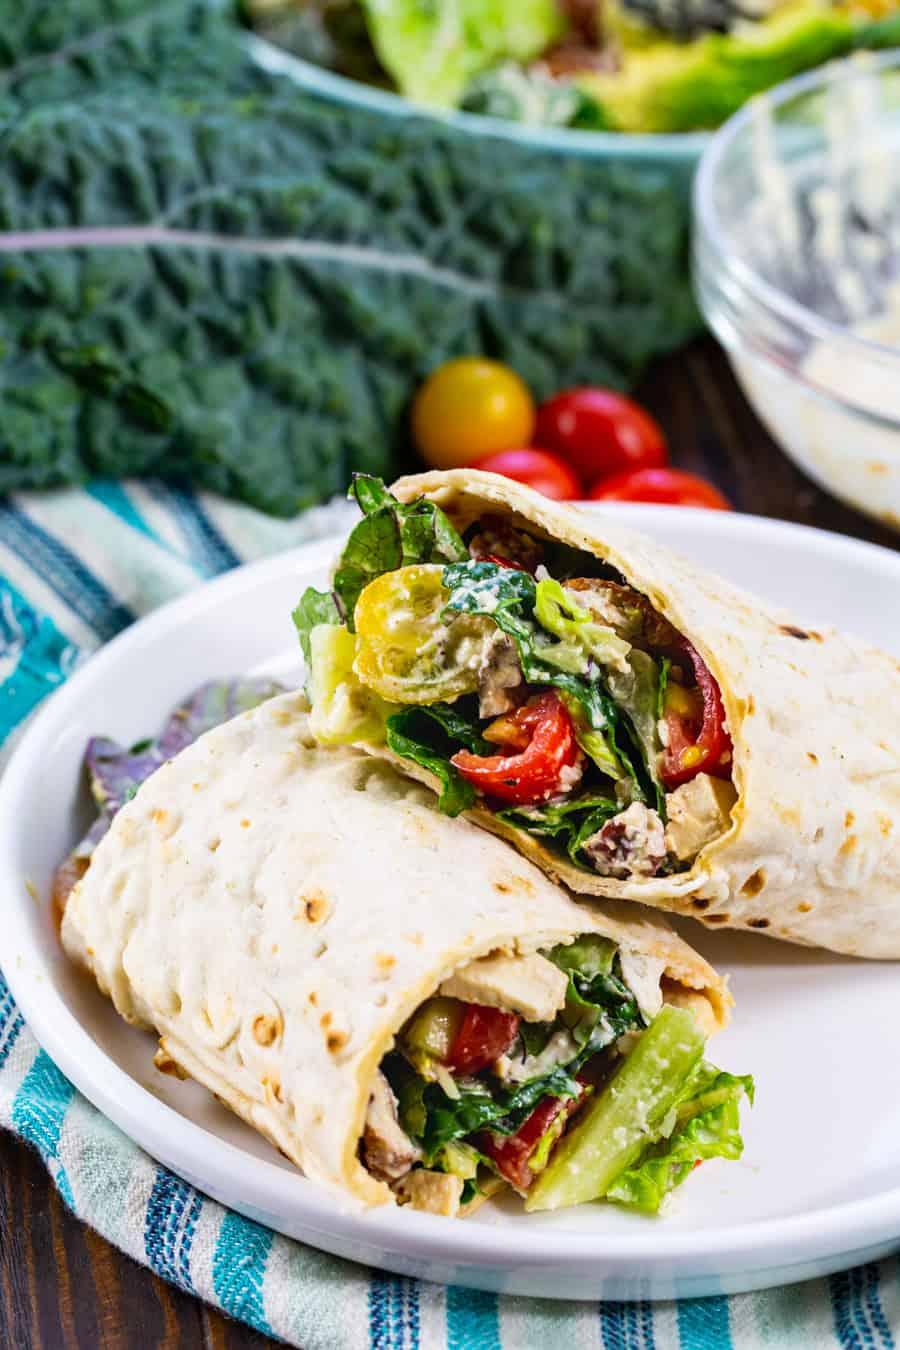 Vegan Kale Caesar Roll-Up on a plate.